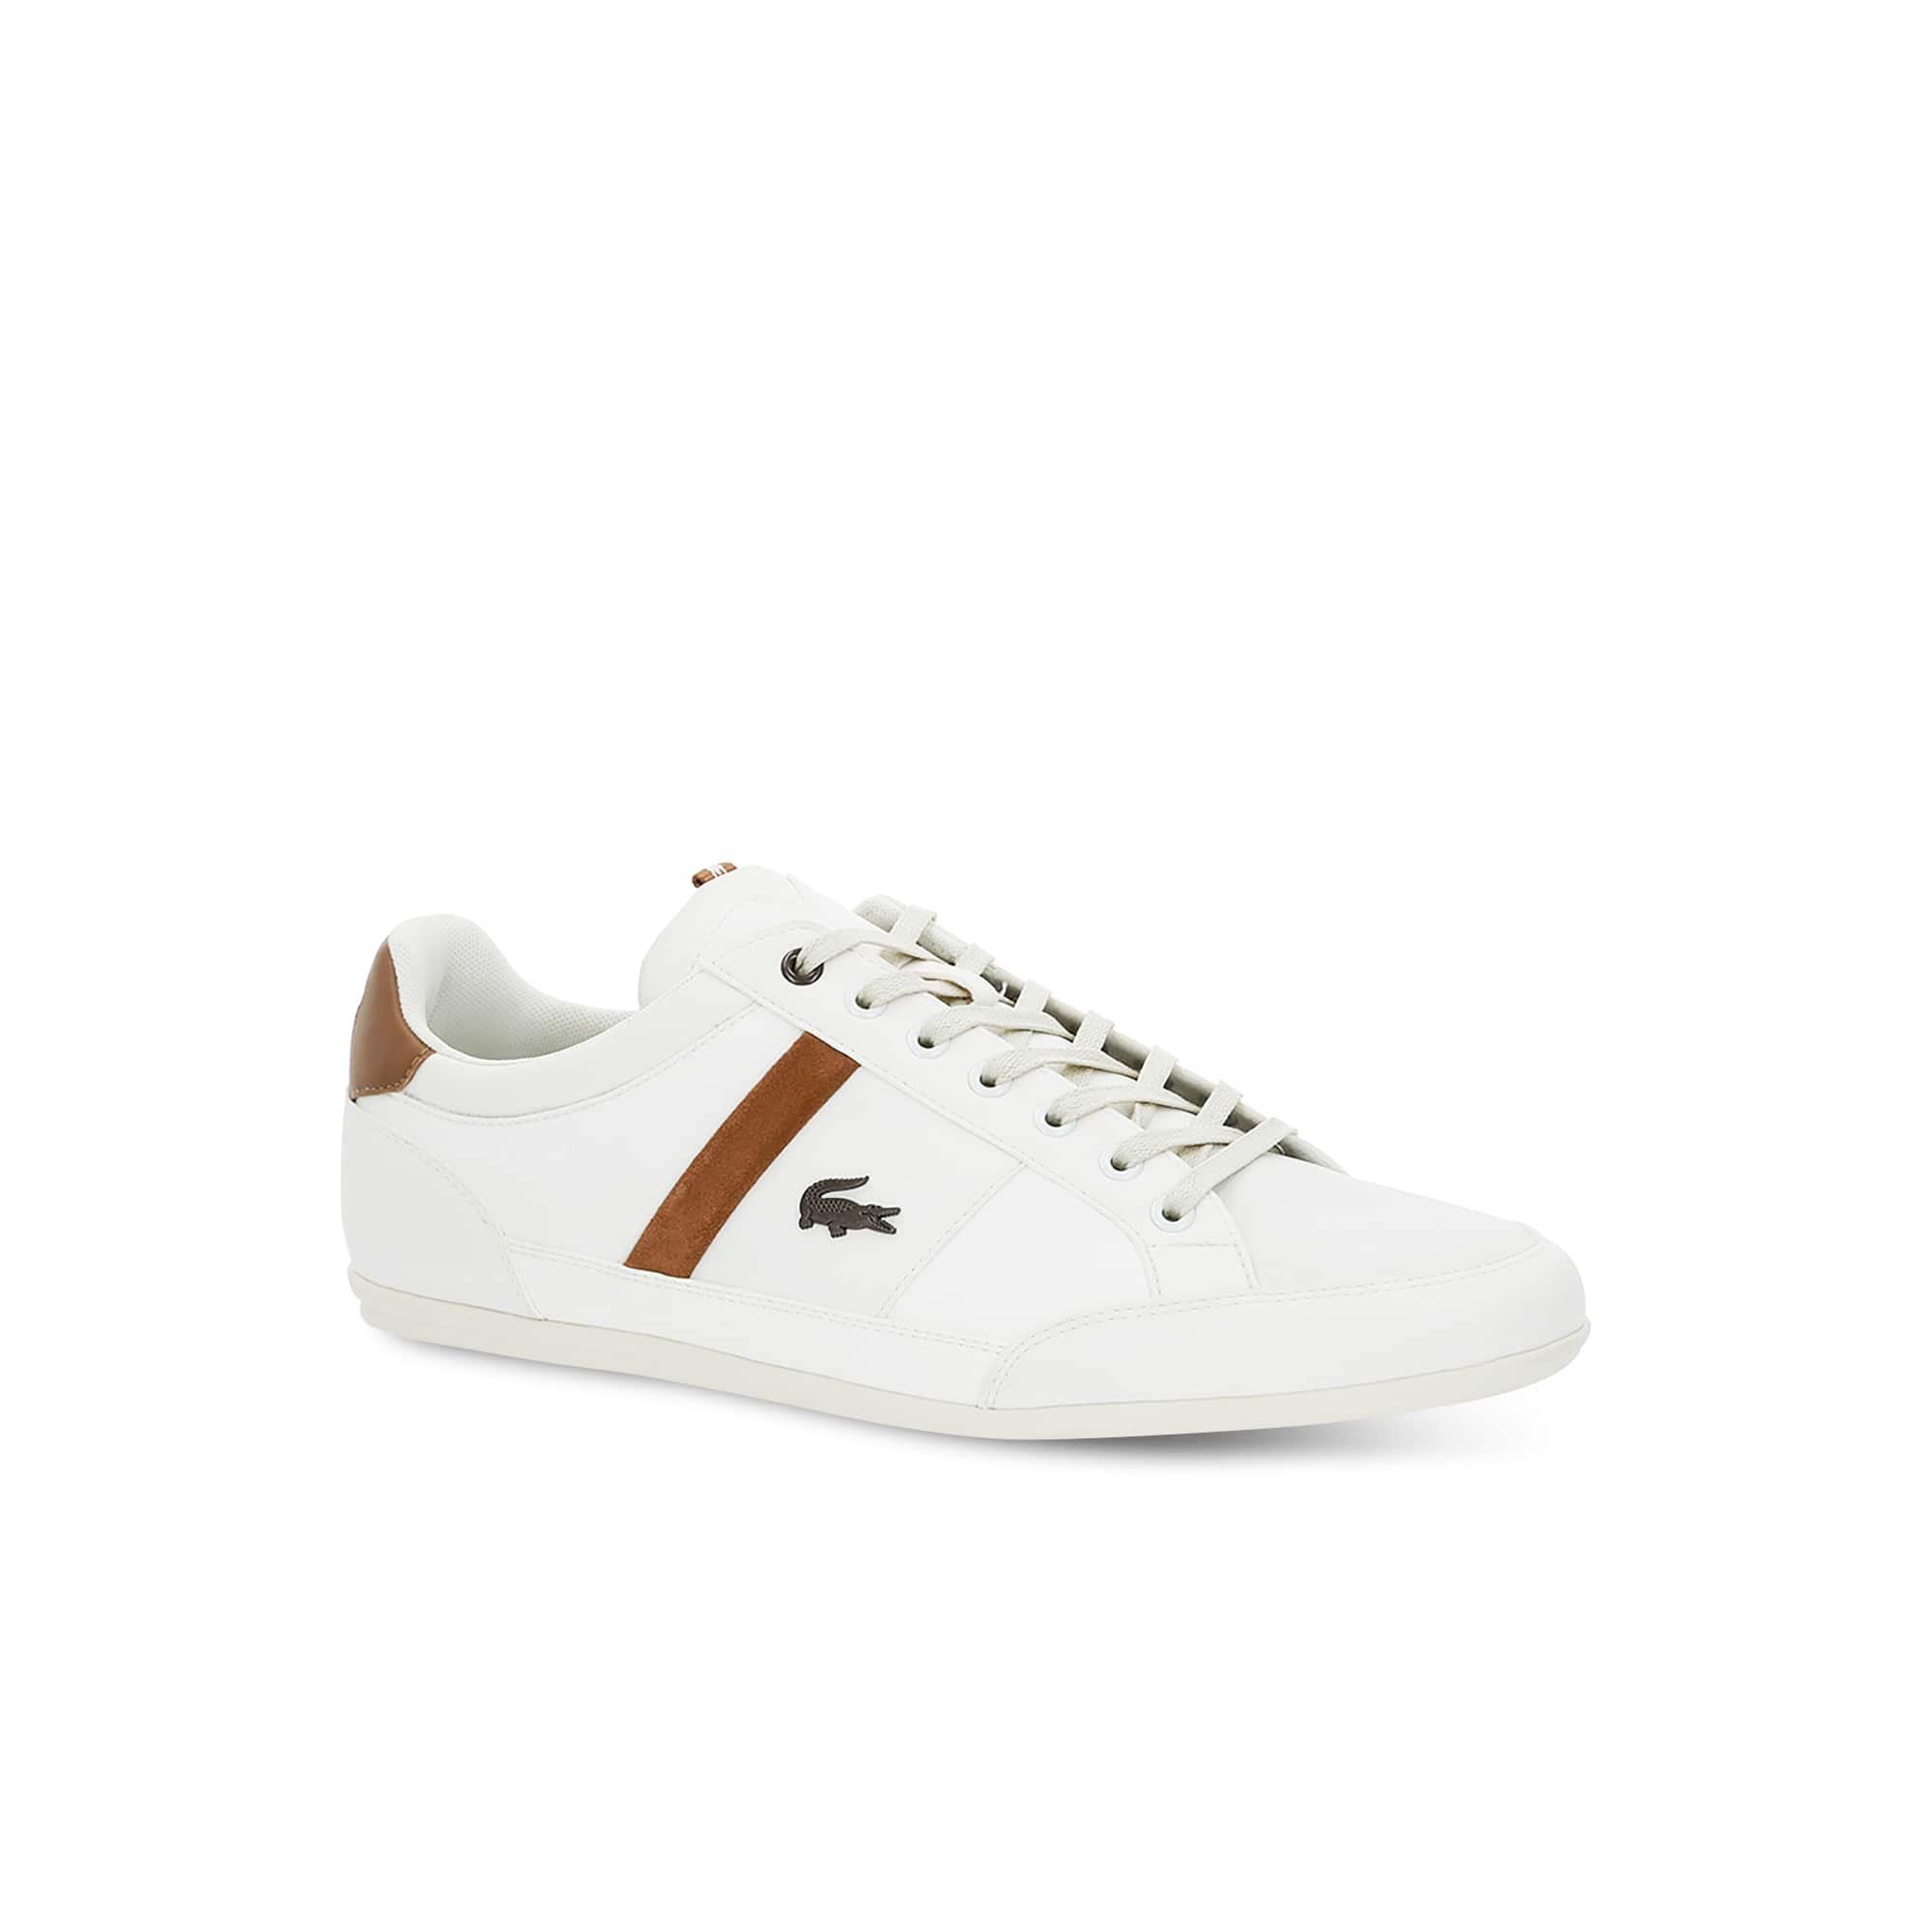 33ee9424045 Men s Chaymon Embossed Leather Sneakers